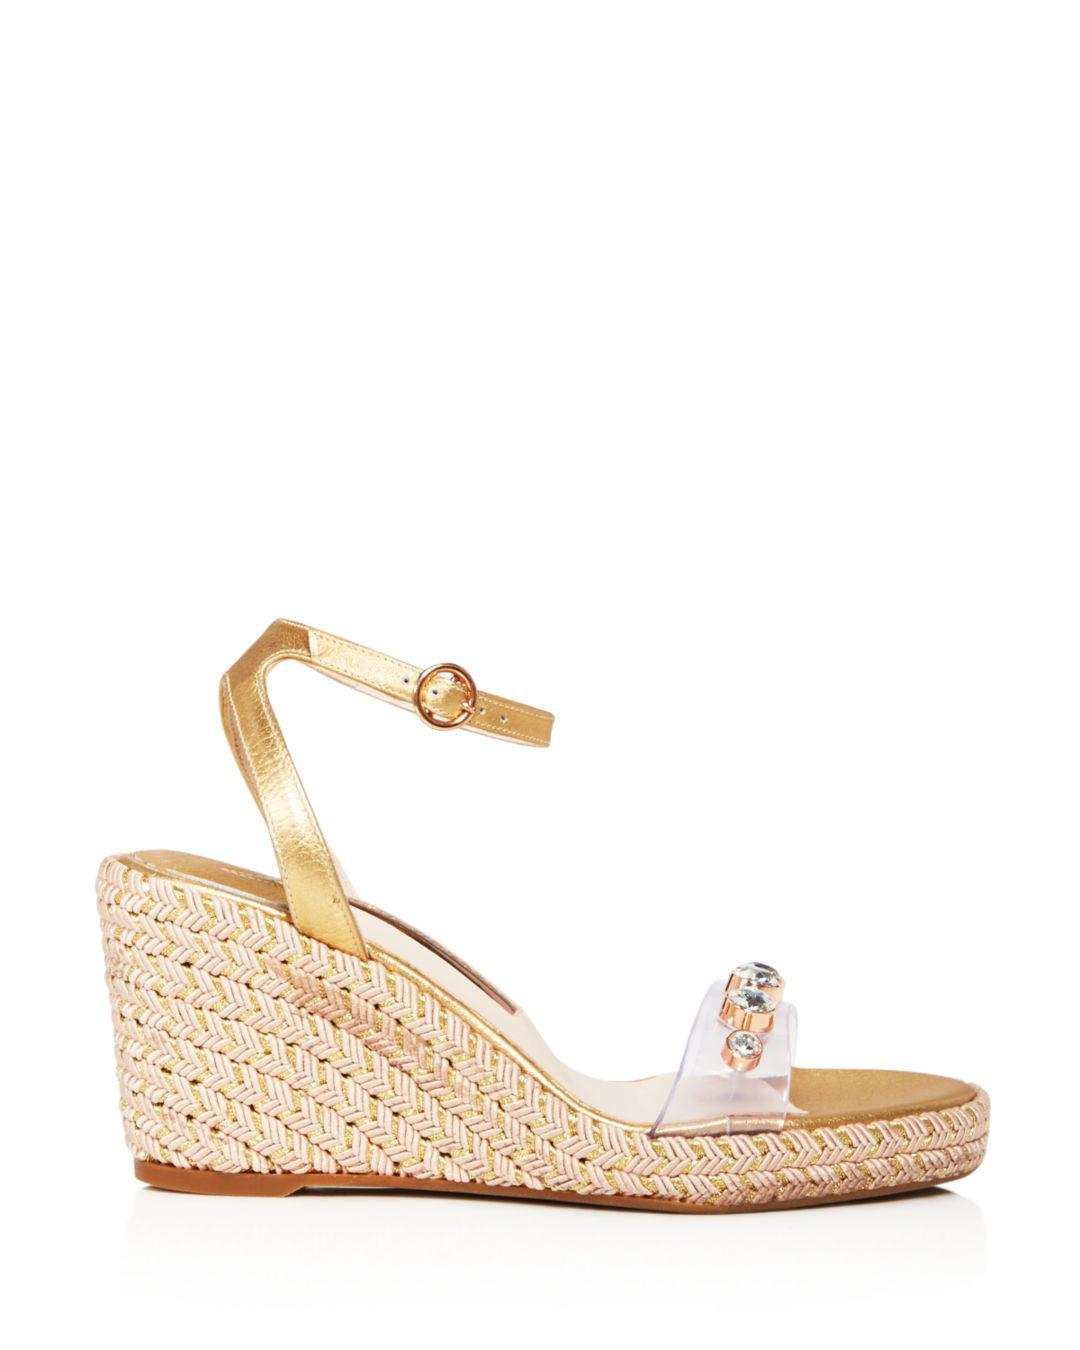 9106d76b3 Lyst - Sophia Webster Women s Dina Open Toe Jeweled Wedge Espadrille Sandals  in Metallic